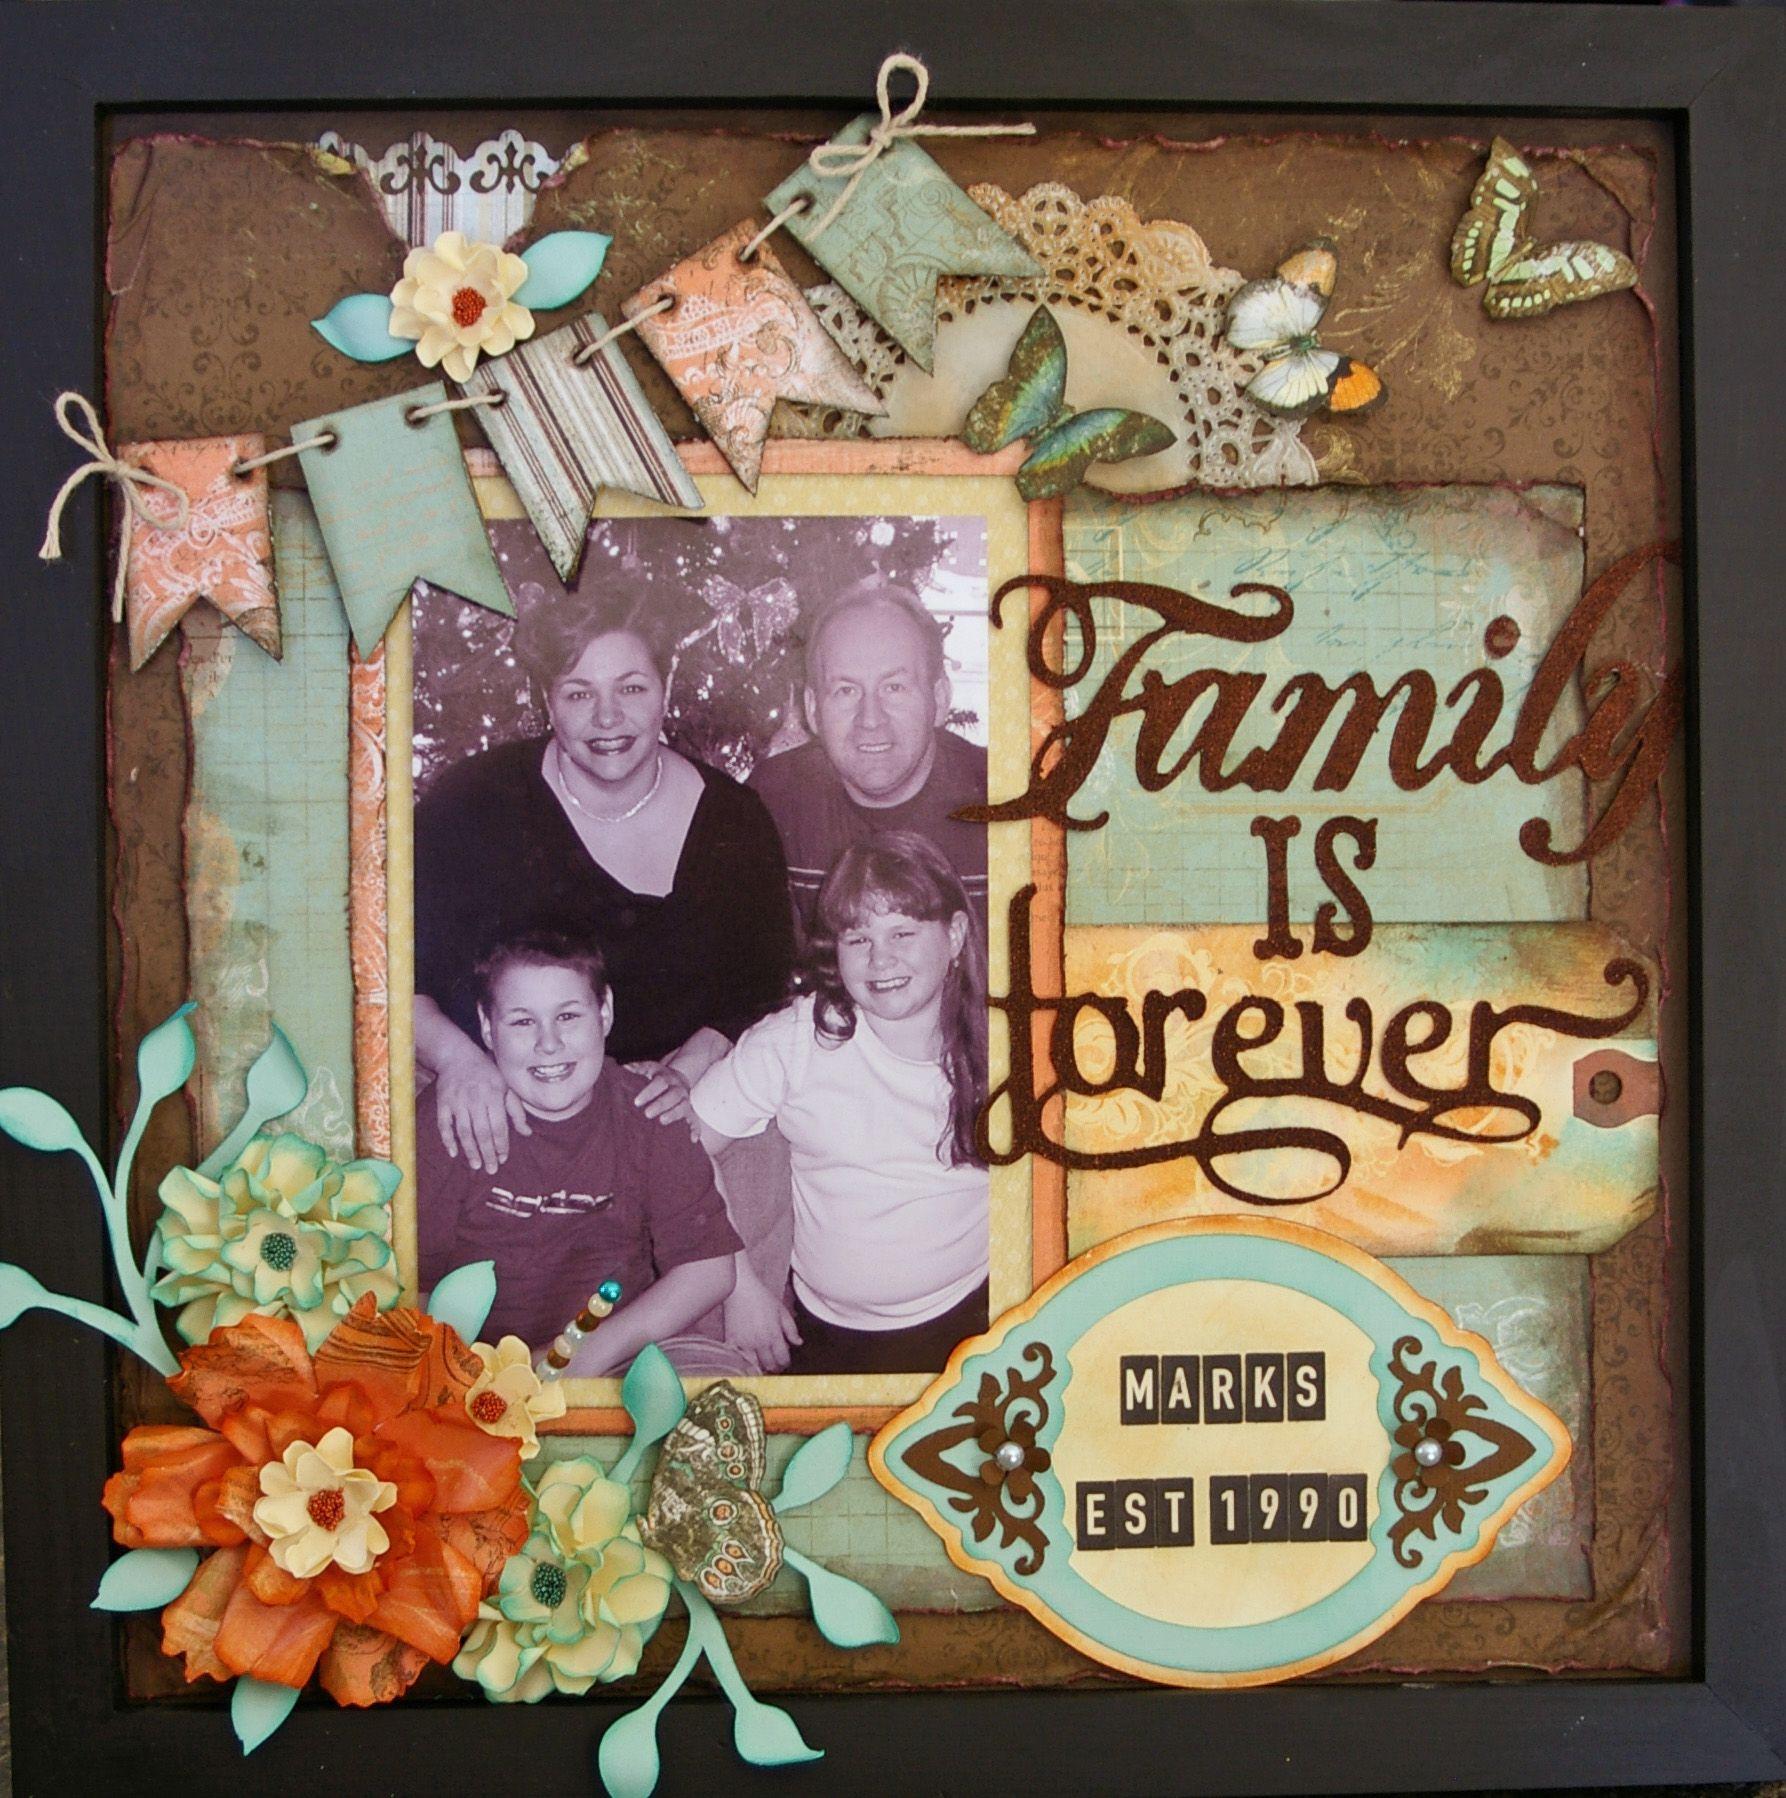 GREAT idea! Family is Forever 3D frame - Scrapbook.com | Scrapbook ...